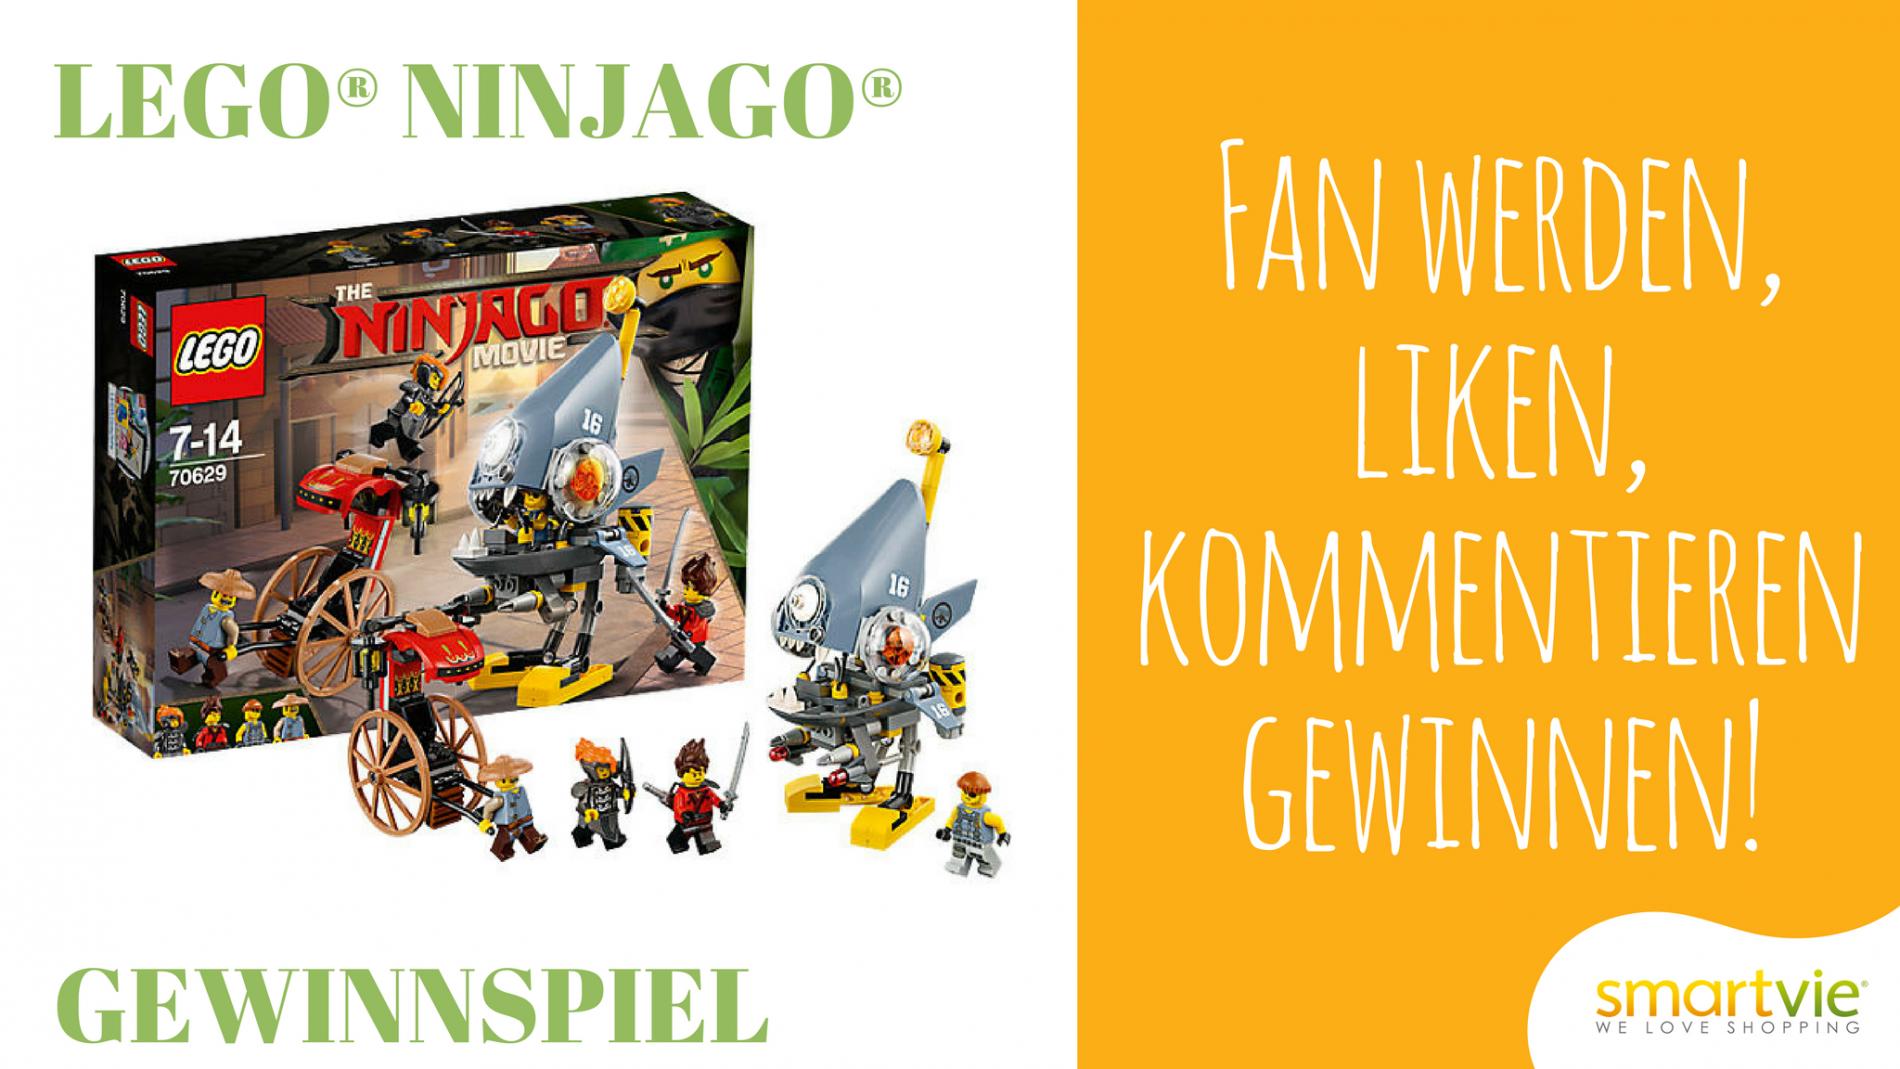 Lego Ninjago Gewinnspiel smartvie